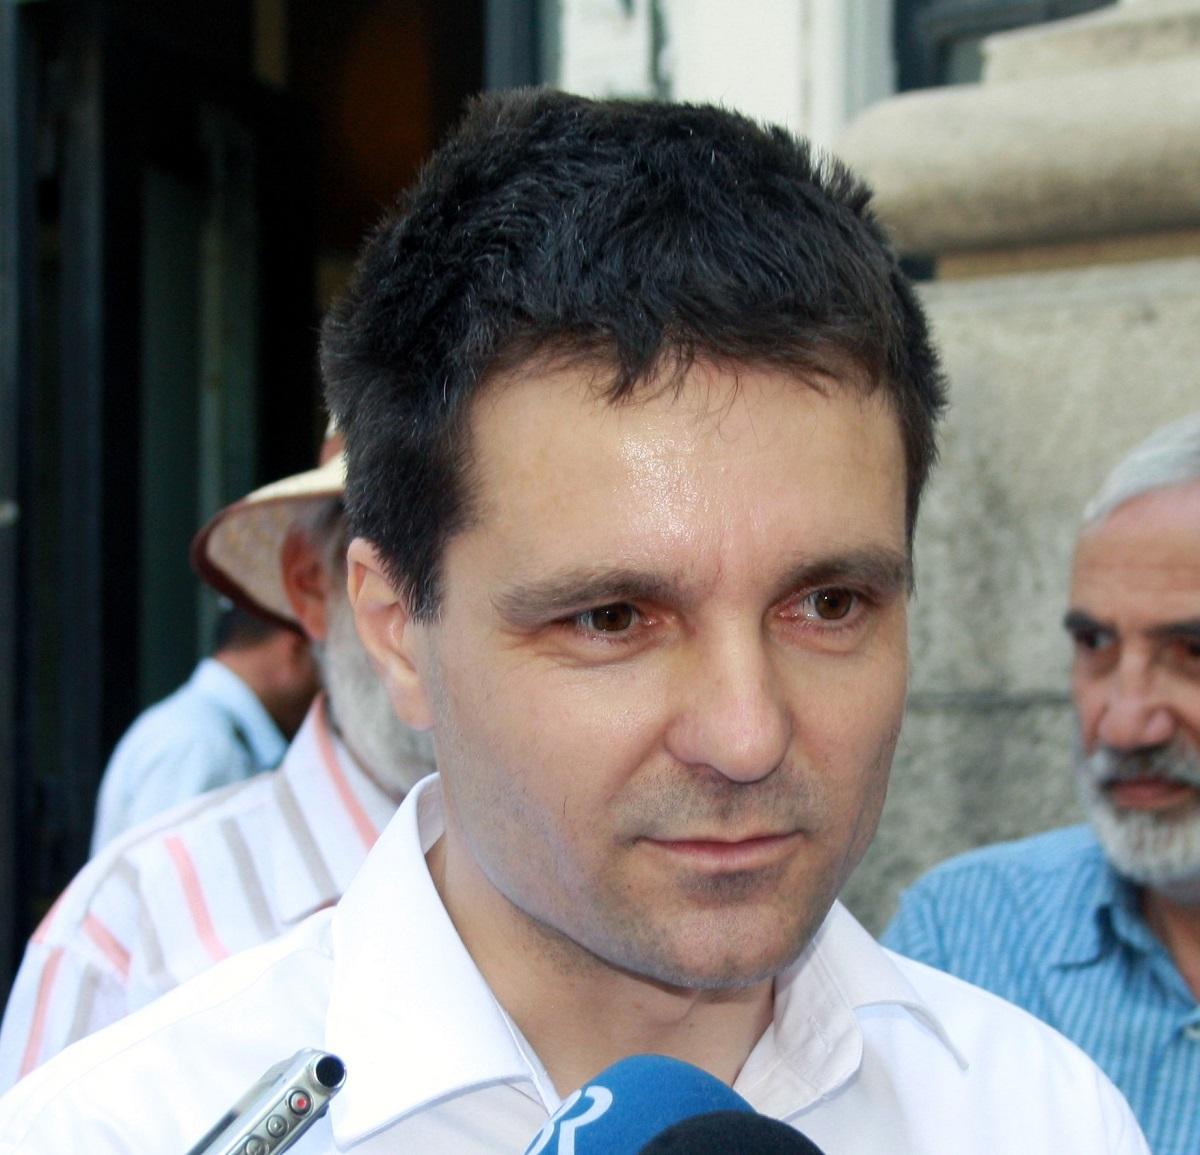 Nicușor_Dan_candidatura_bgiu_1cb2e.jpg